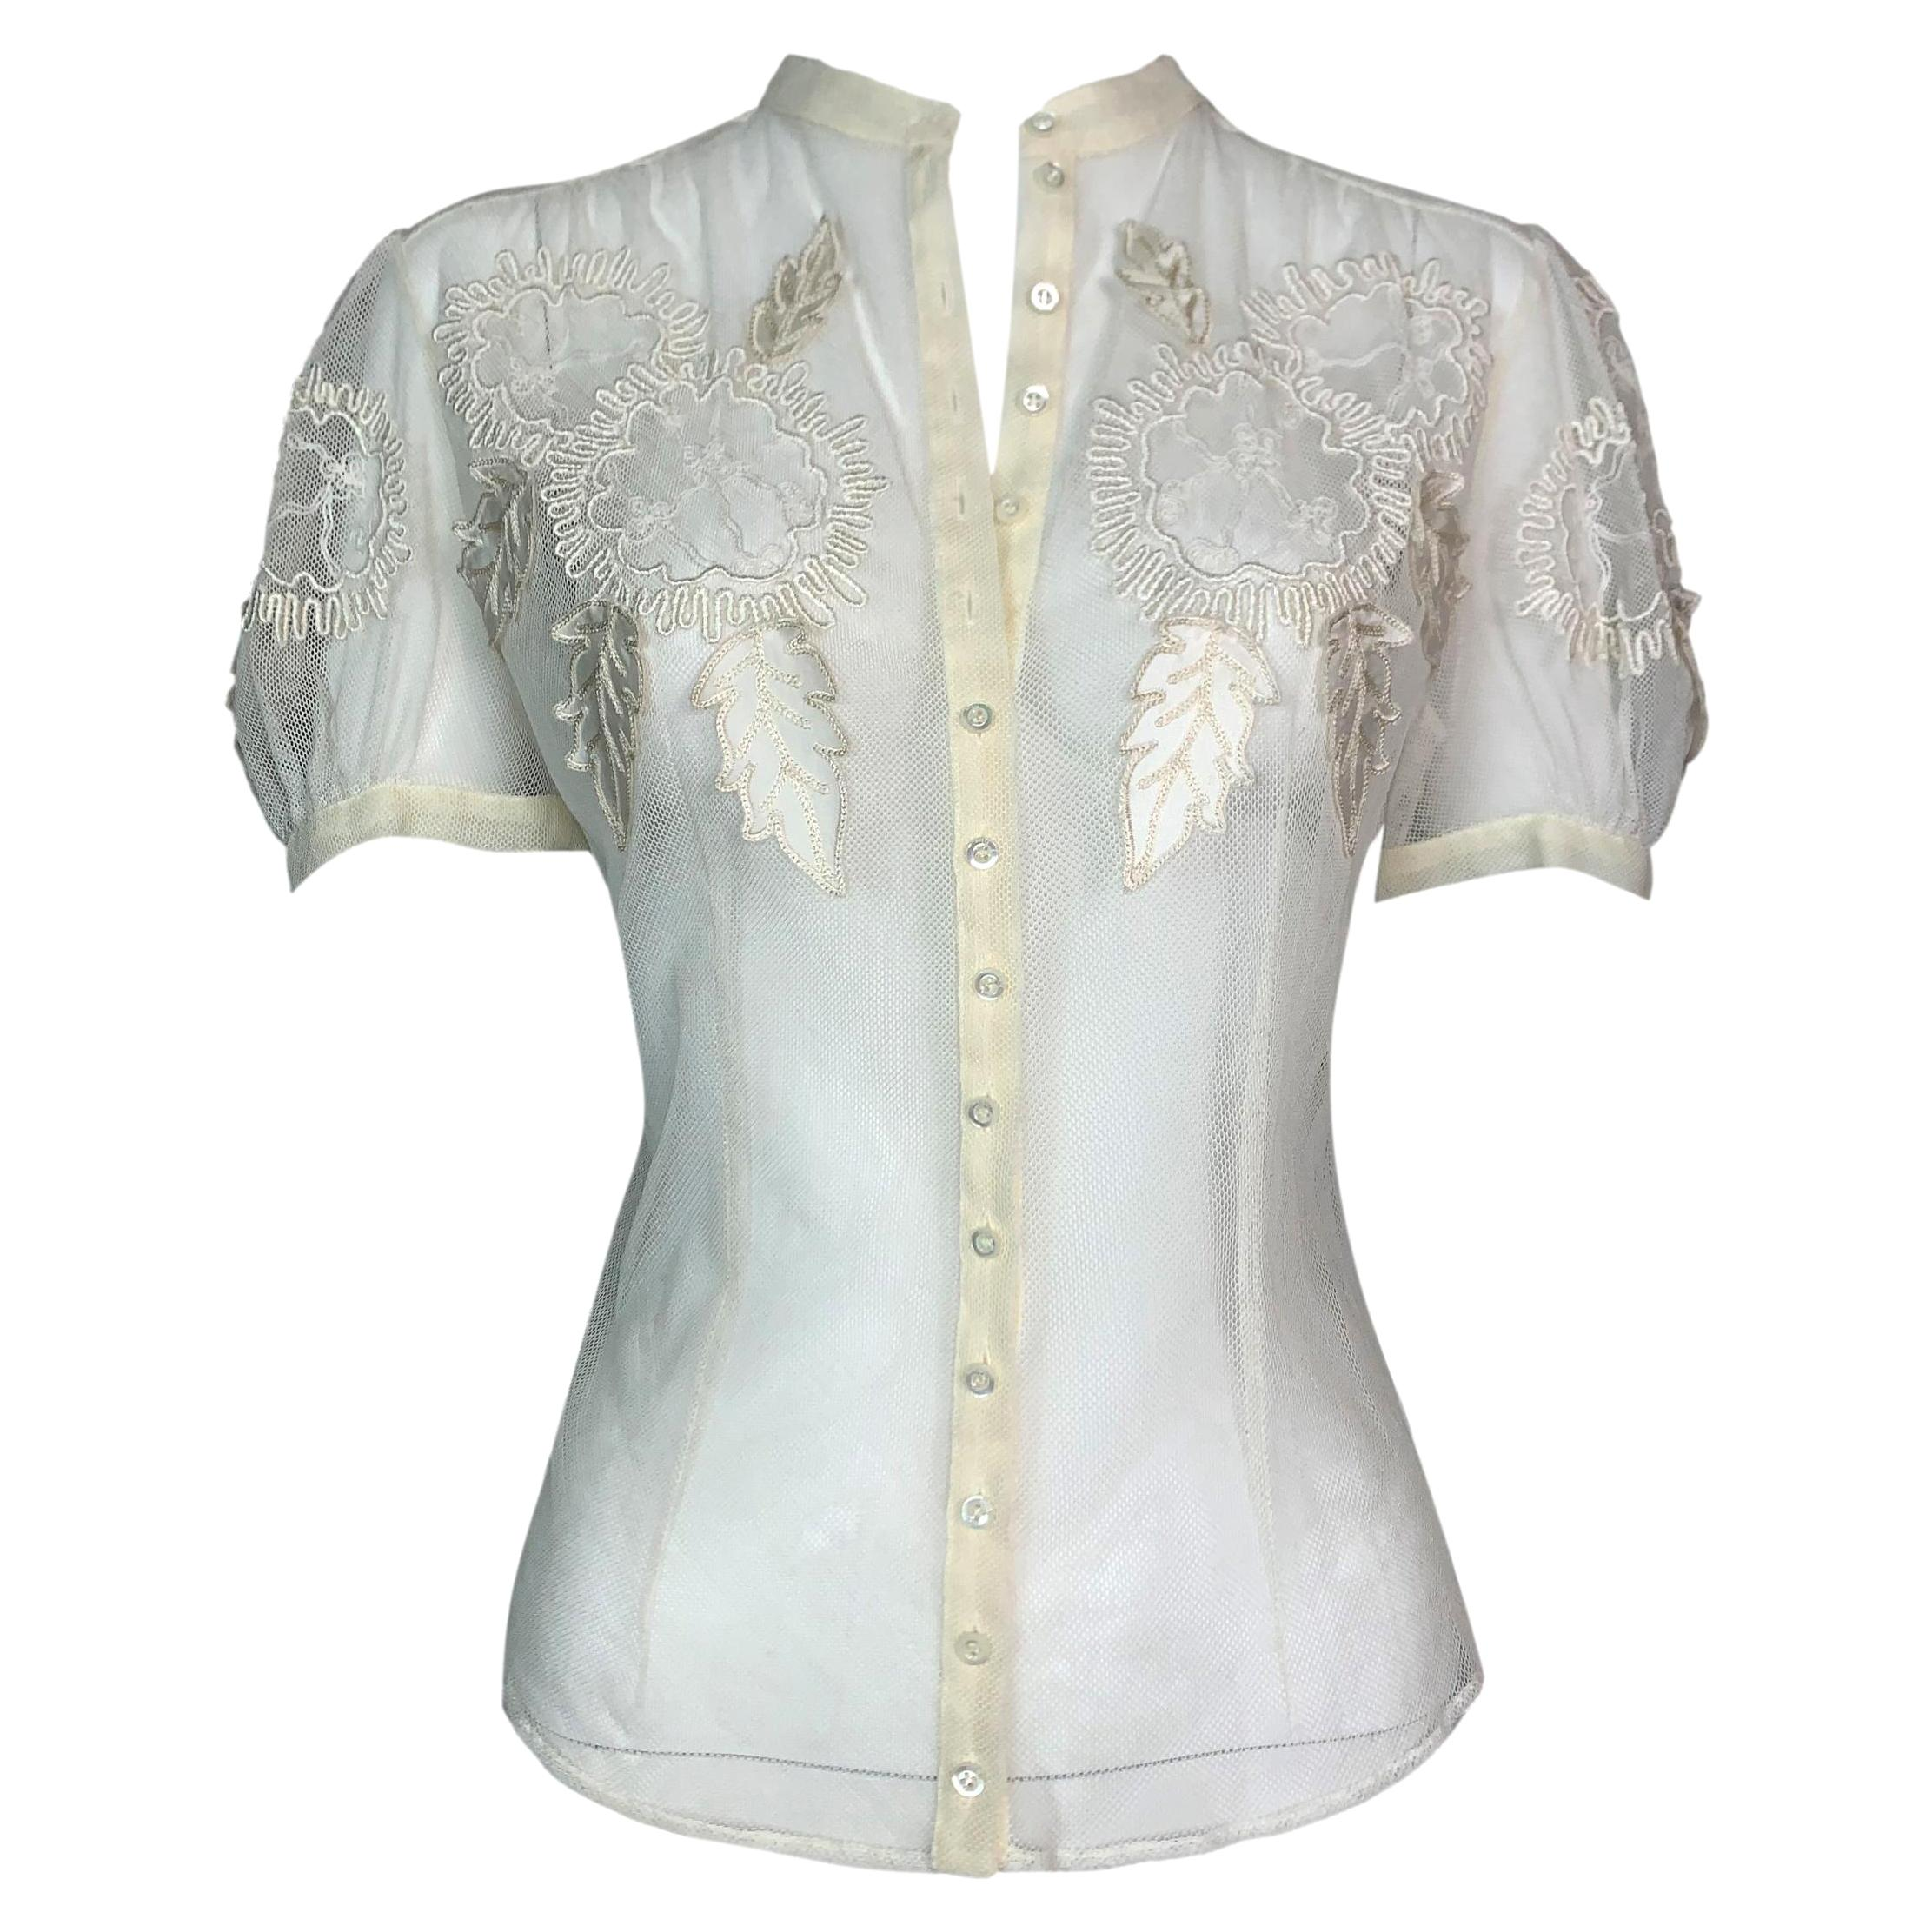 S/S 2006 Christian Dior John Galliano Sheer Cream Mesh Button Down Top